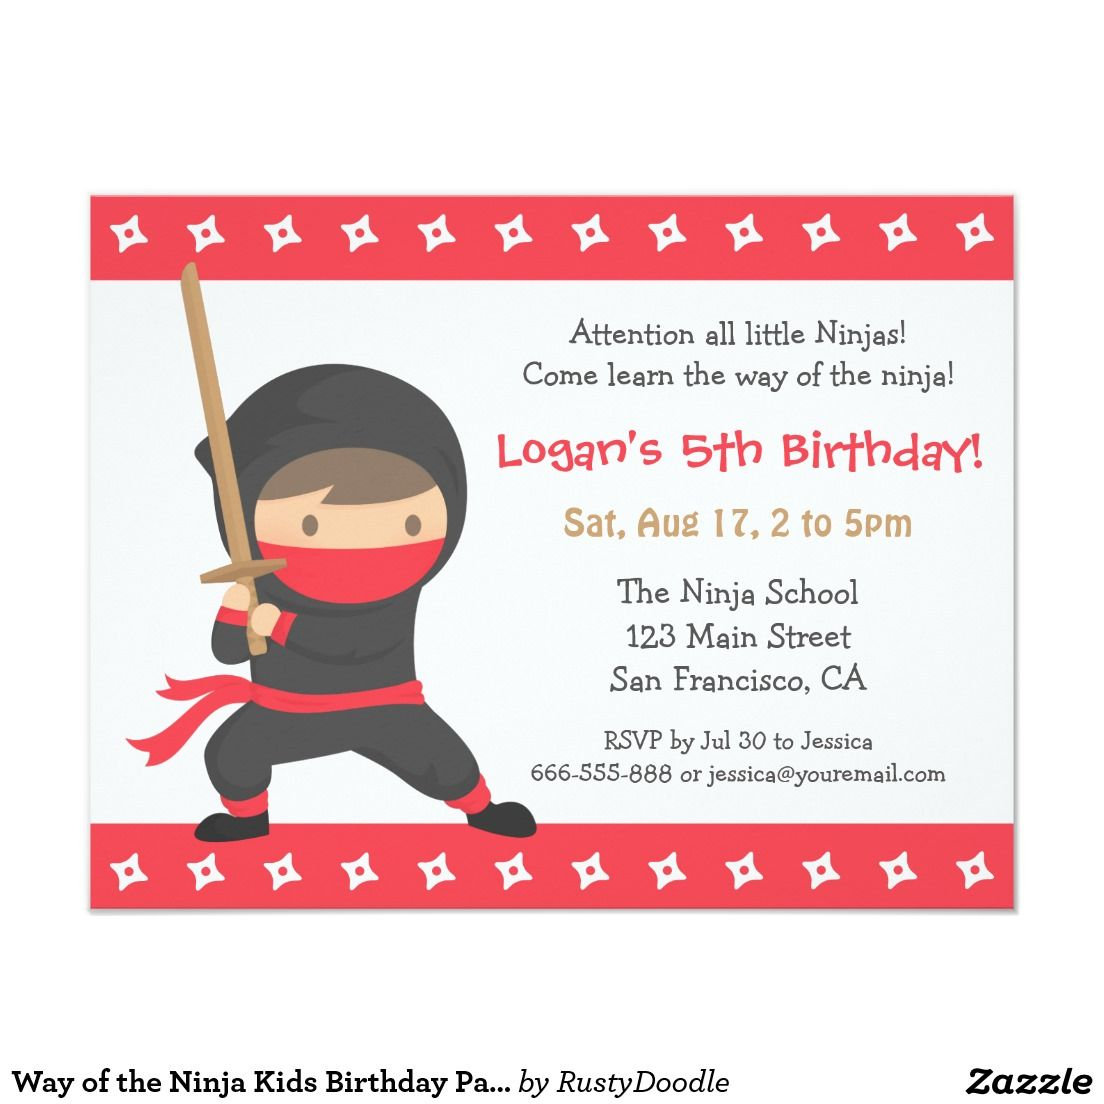 Way of the Ninja Kids Birthday Party Invitations | CELEBRATIONS ...